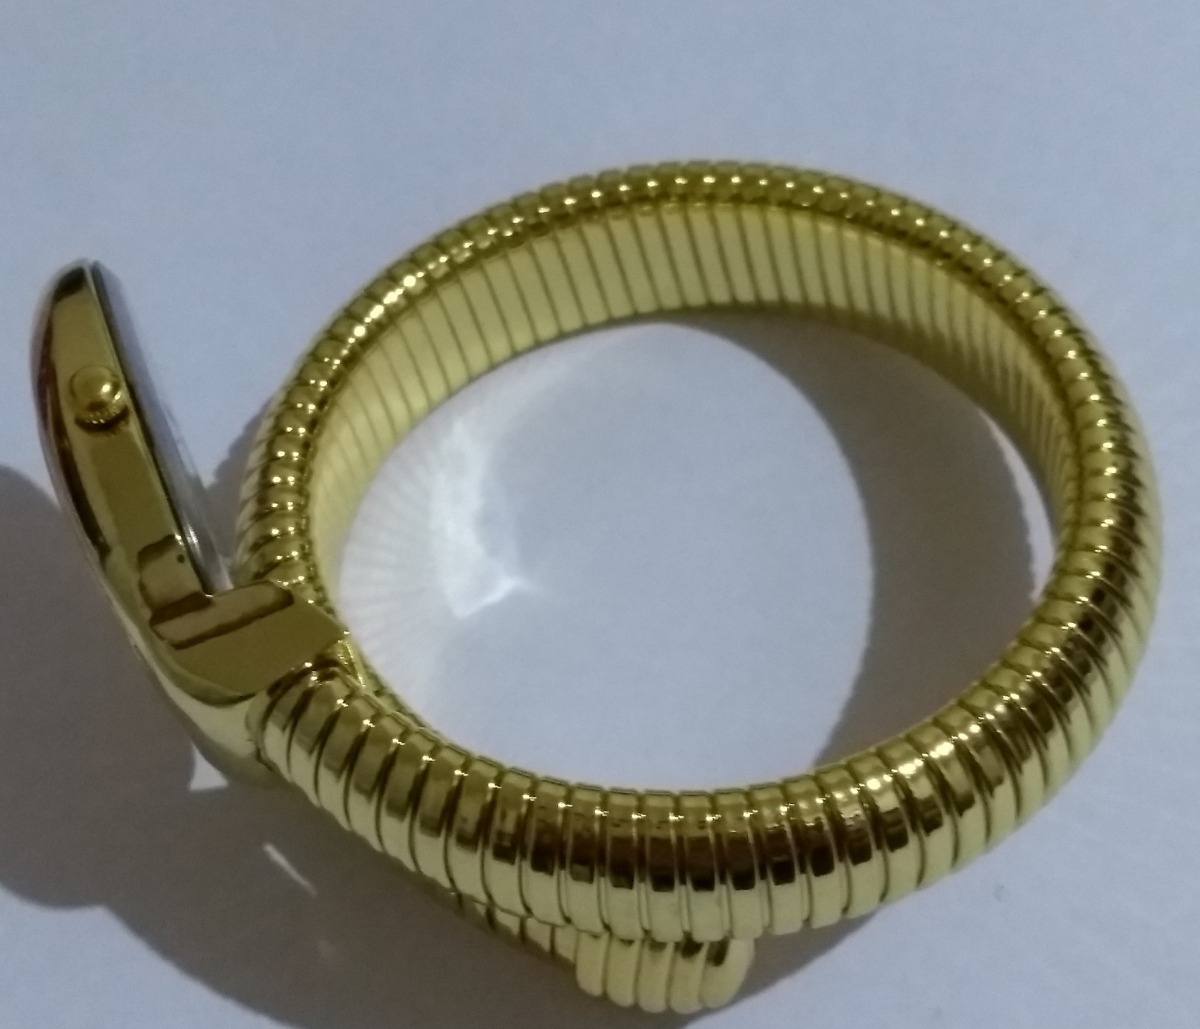 ef7703afd53 relógio pulso feminino serpente cobra branco dourado borstn. Carregando  zoom.